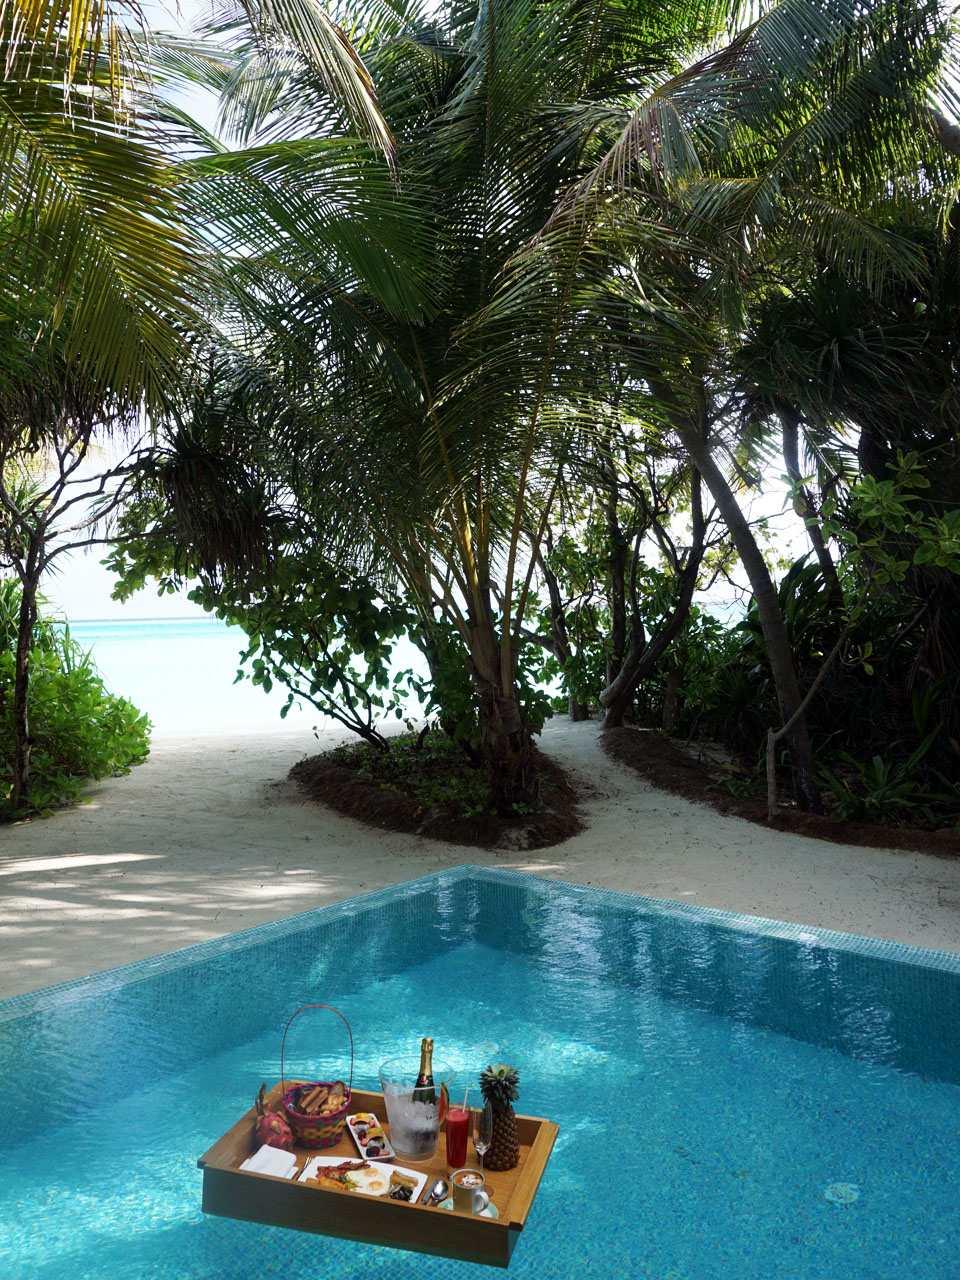 Niyama Private Islands Resort